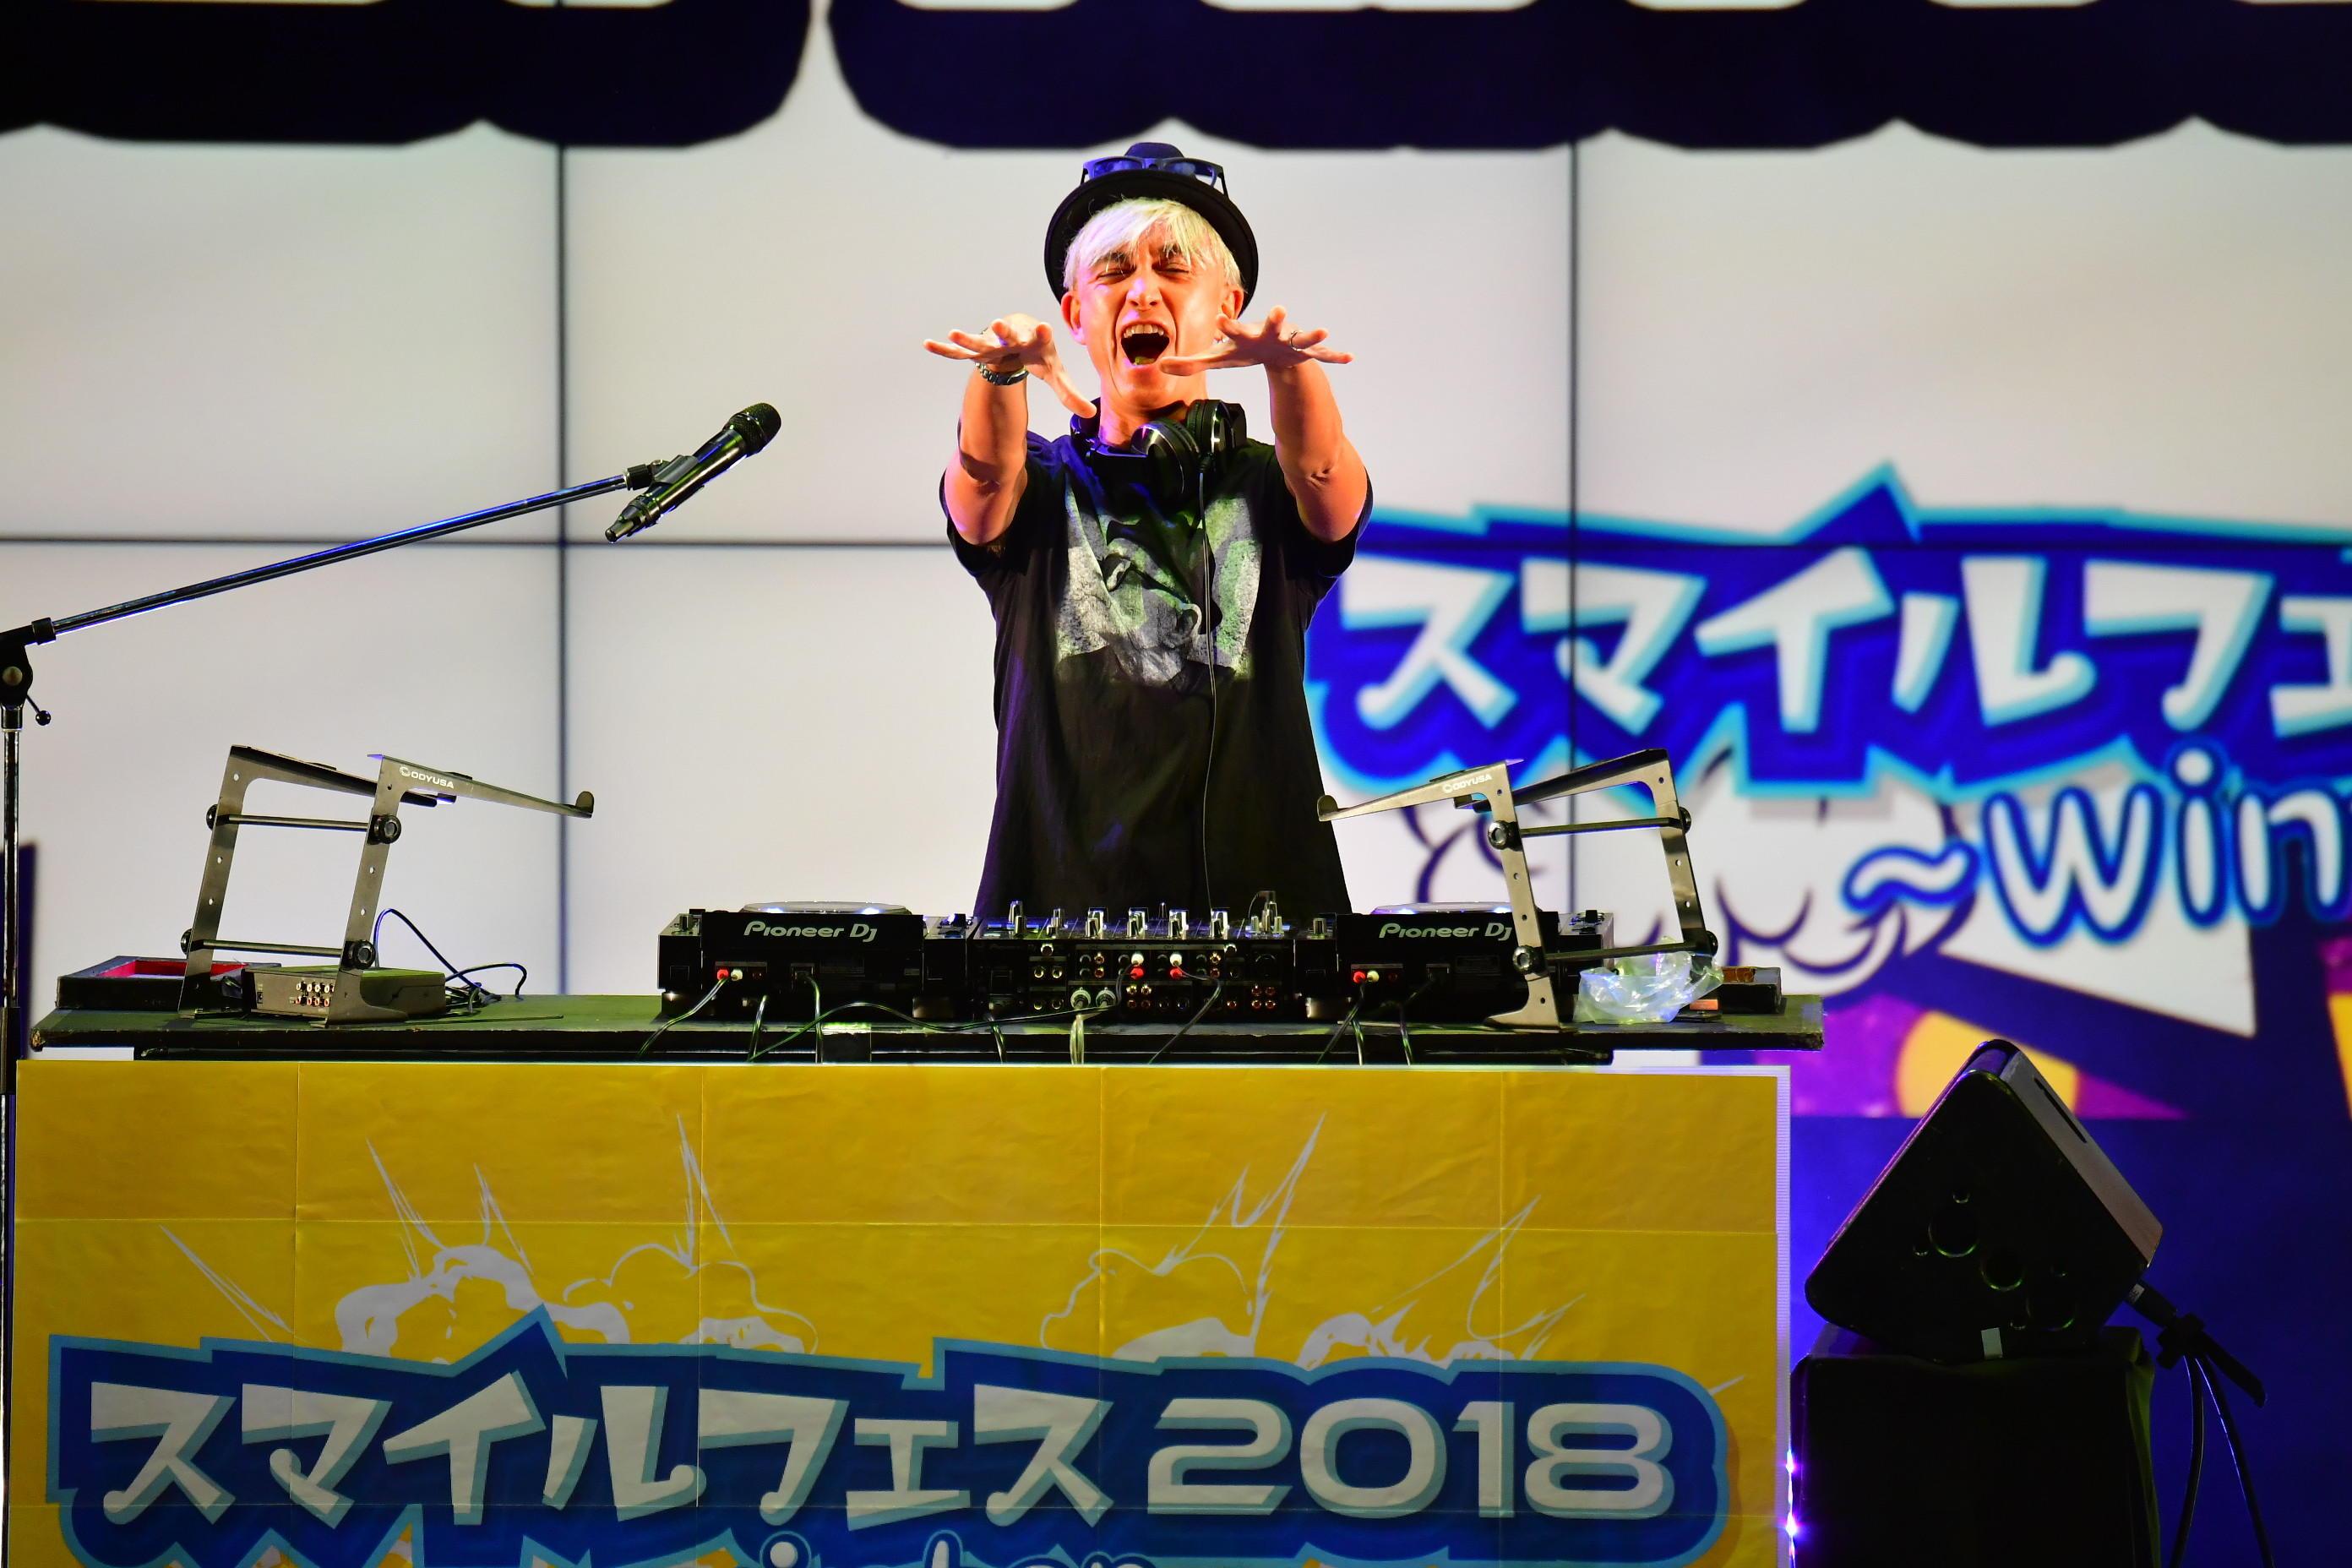 http://news.yoshimoto.co.jp/20180119011500-1be06a30d5b44df5d3d51a89d71bc350db02ec2e.jpg